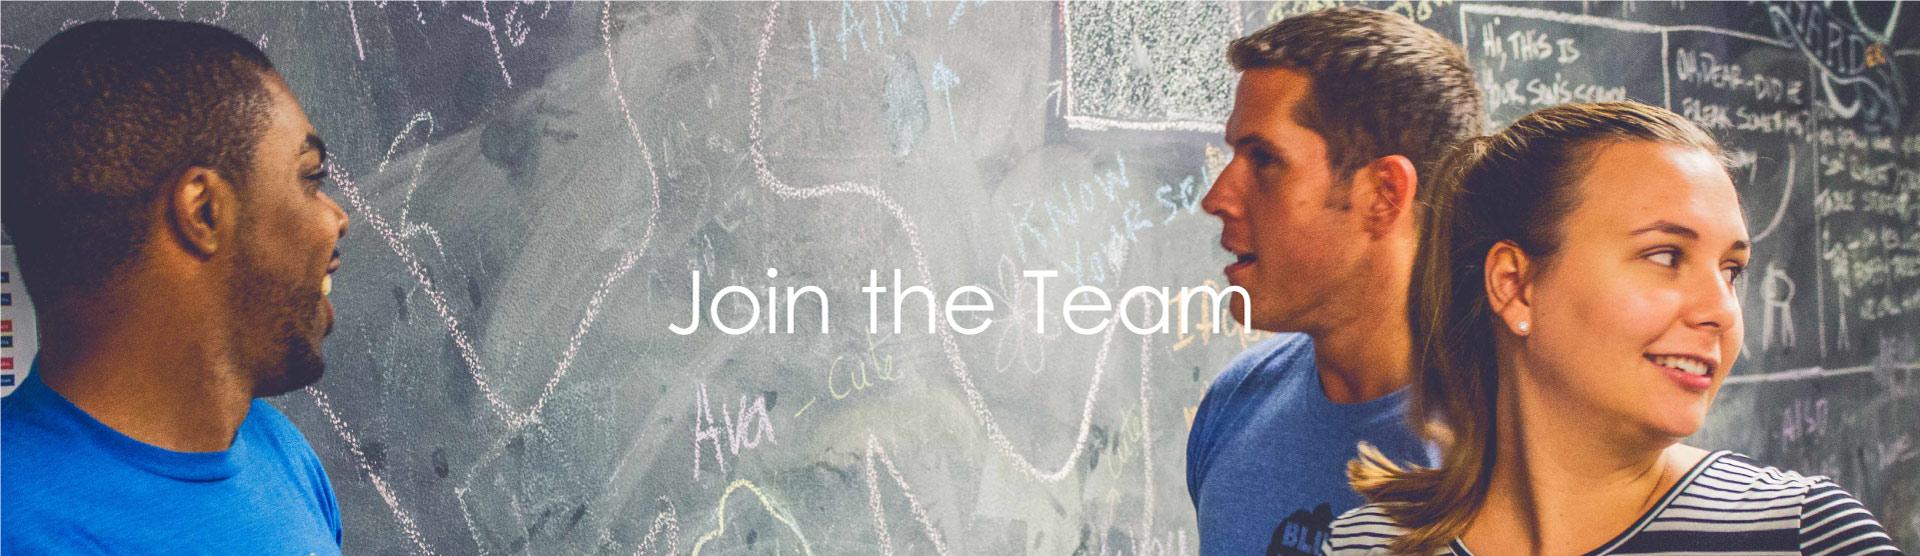 PrimeroEdge Careersw - Join The Team